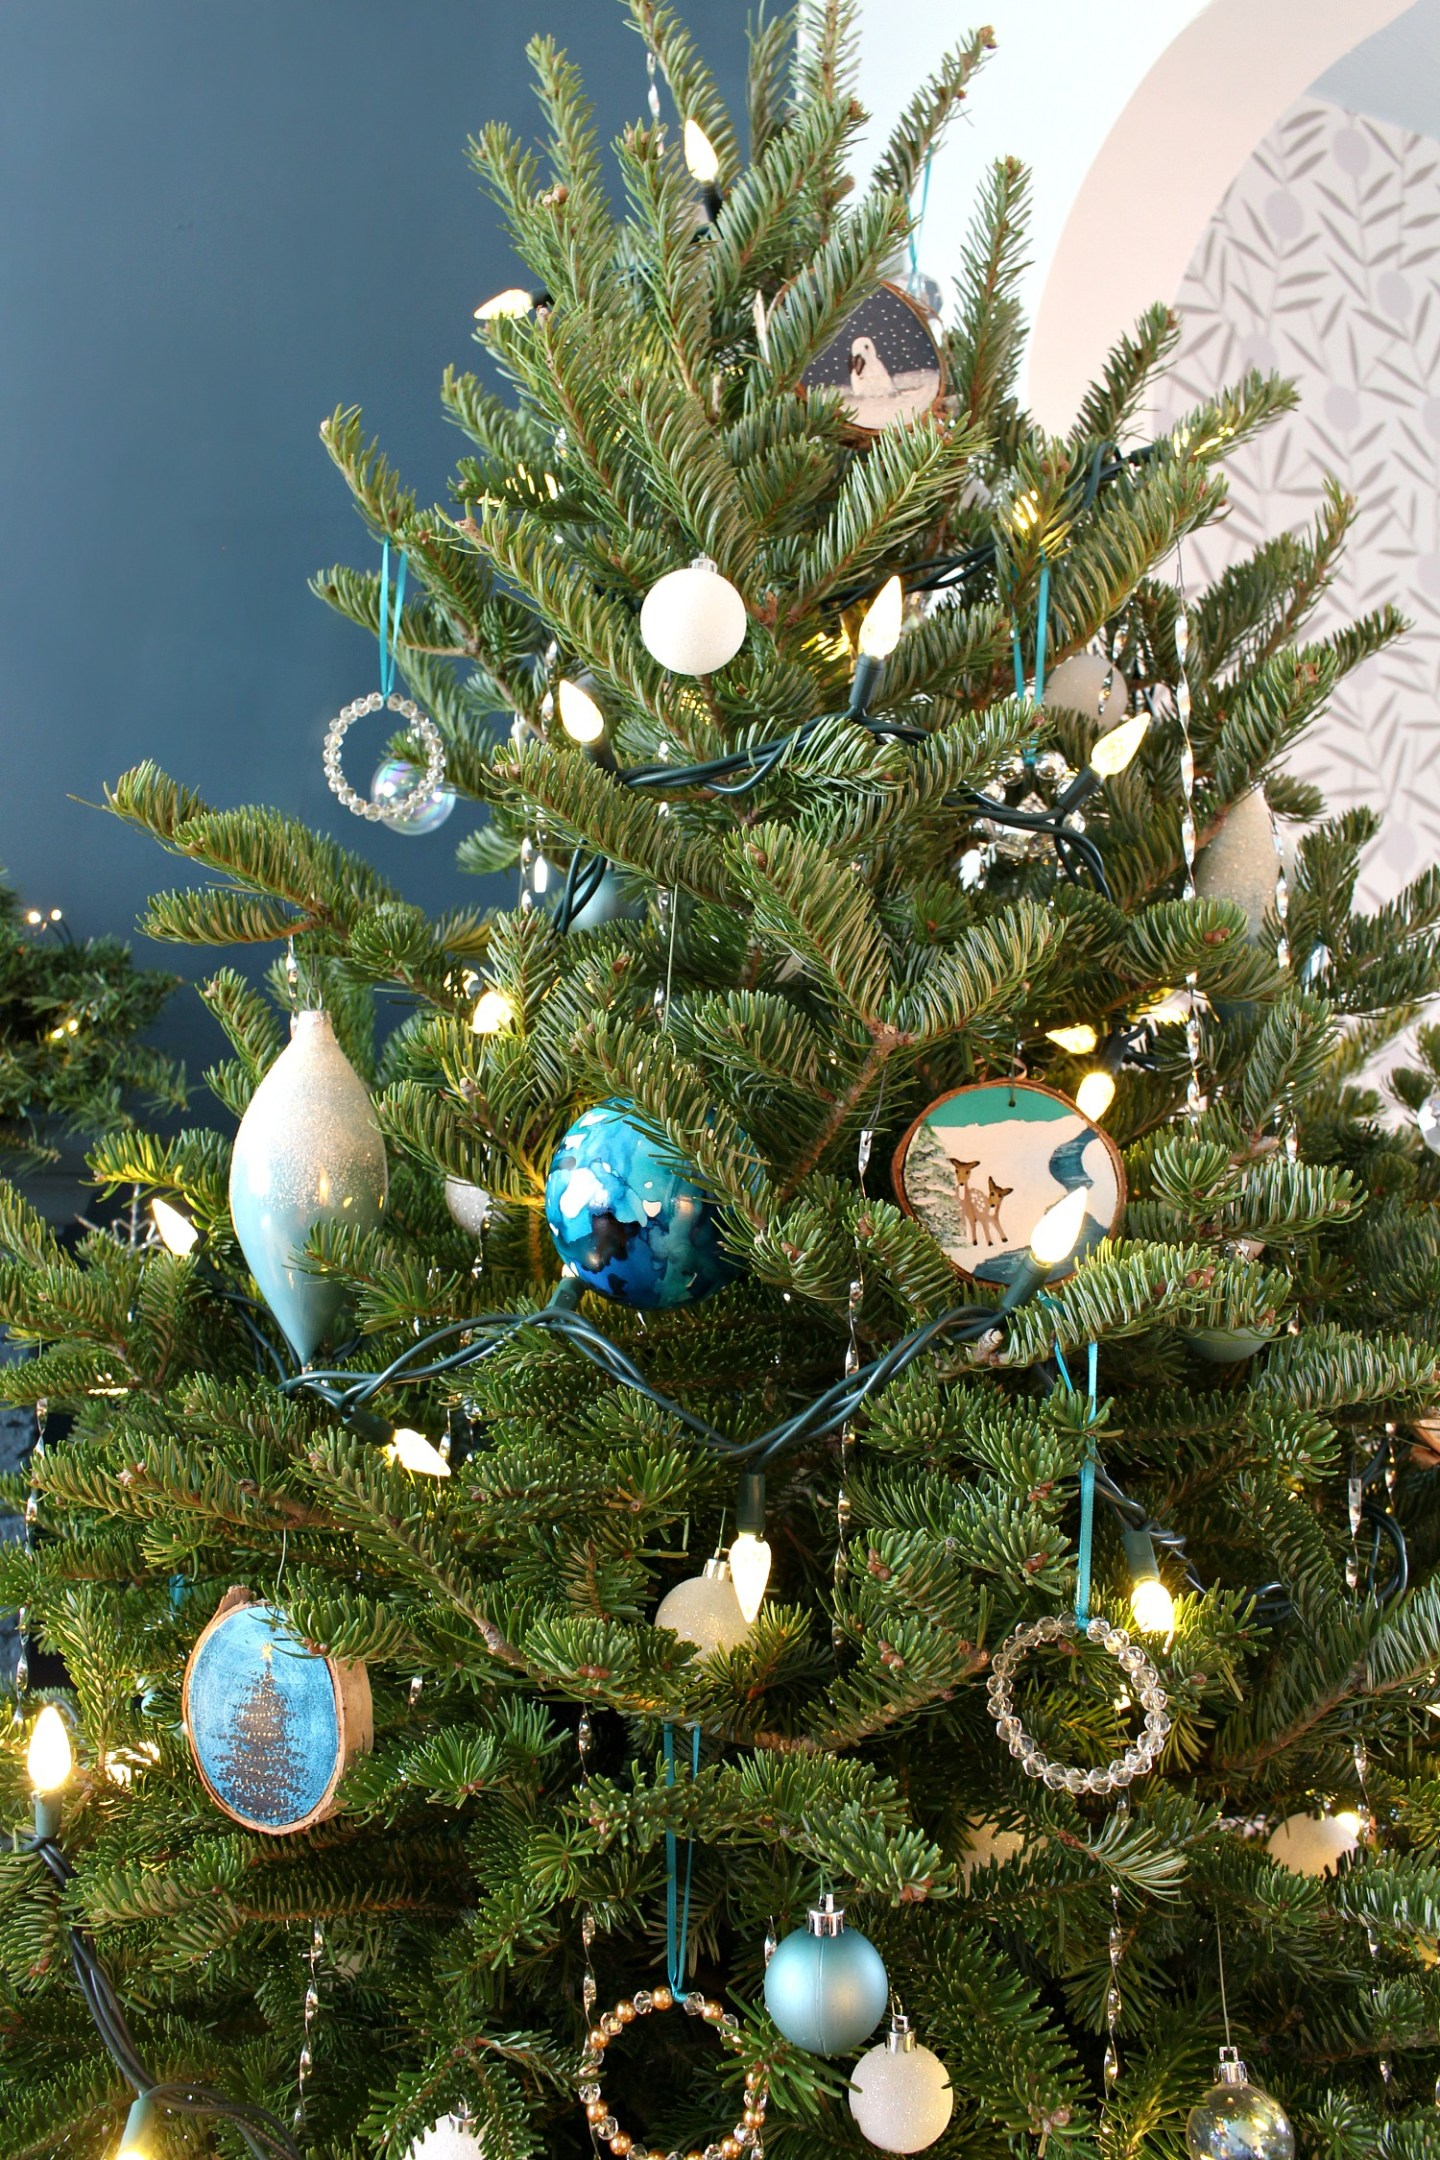 DIY Christmas Tree Ornament Ideas